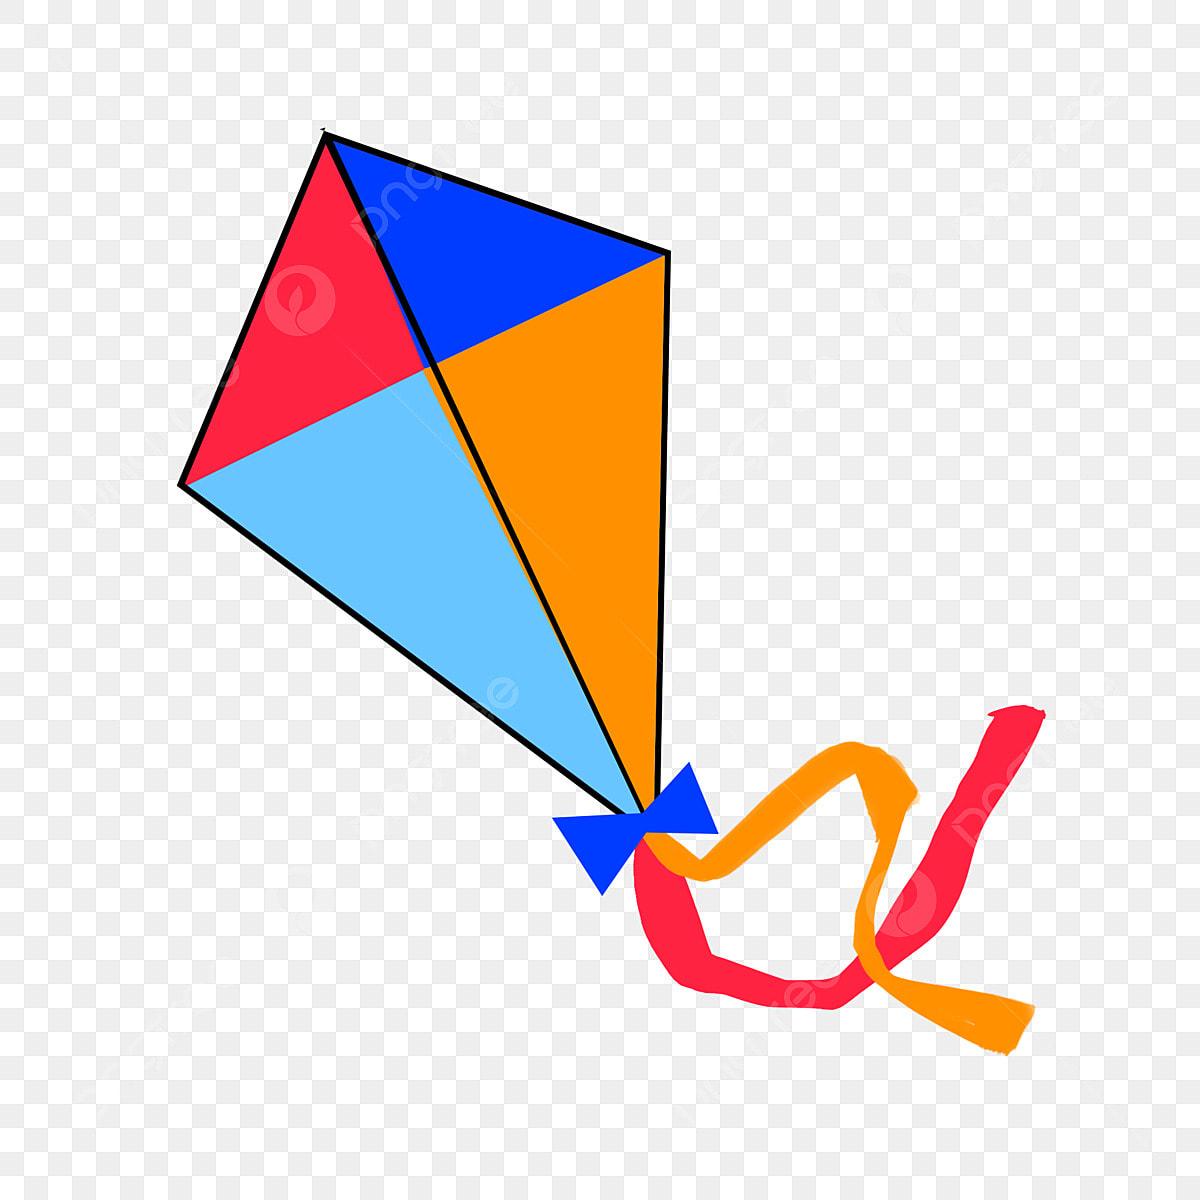 Hand Drawn Kite Cartoon Kite Illustration Color Kite Orange Ribbon